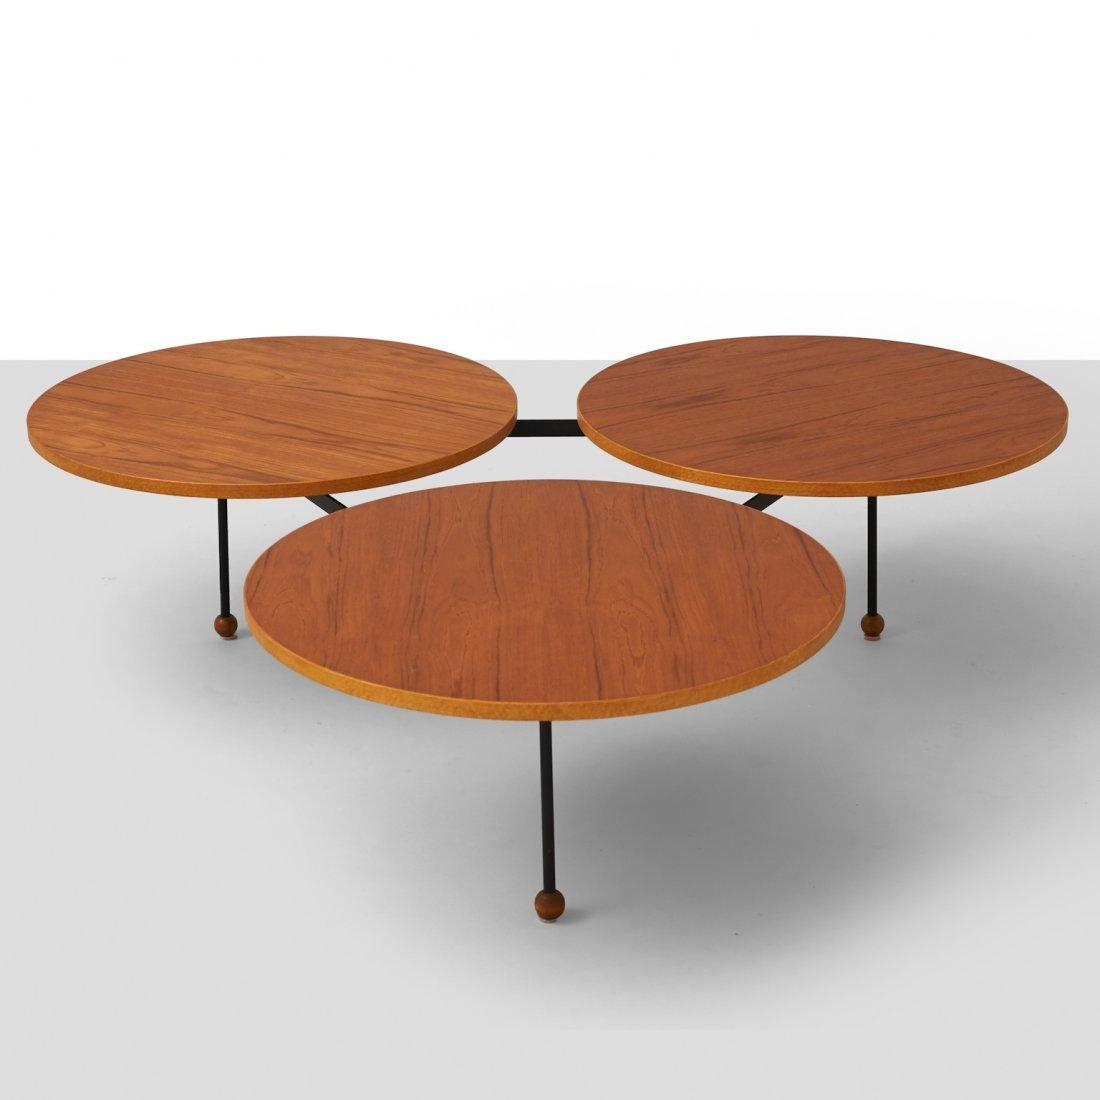 Grossman flying saucer coffee table greta grossman flying saucer coffee table geotapseo Gallery